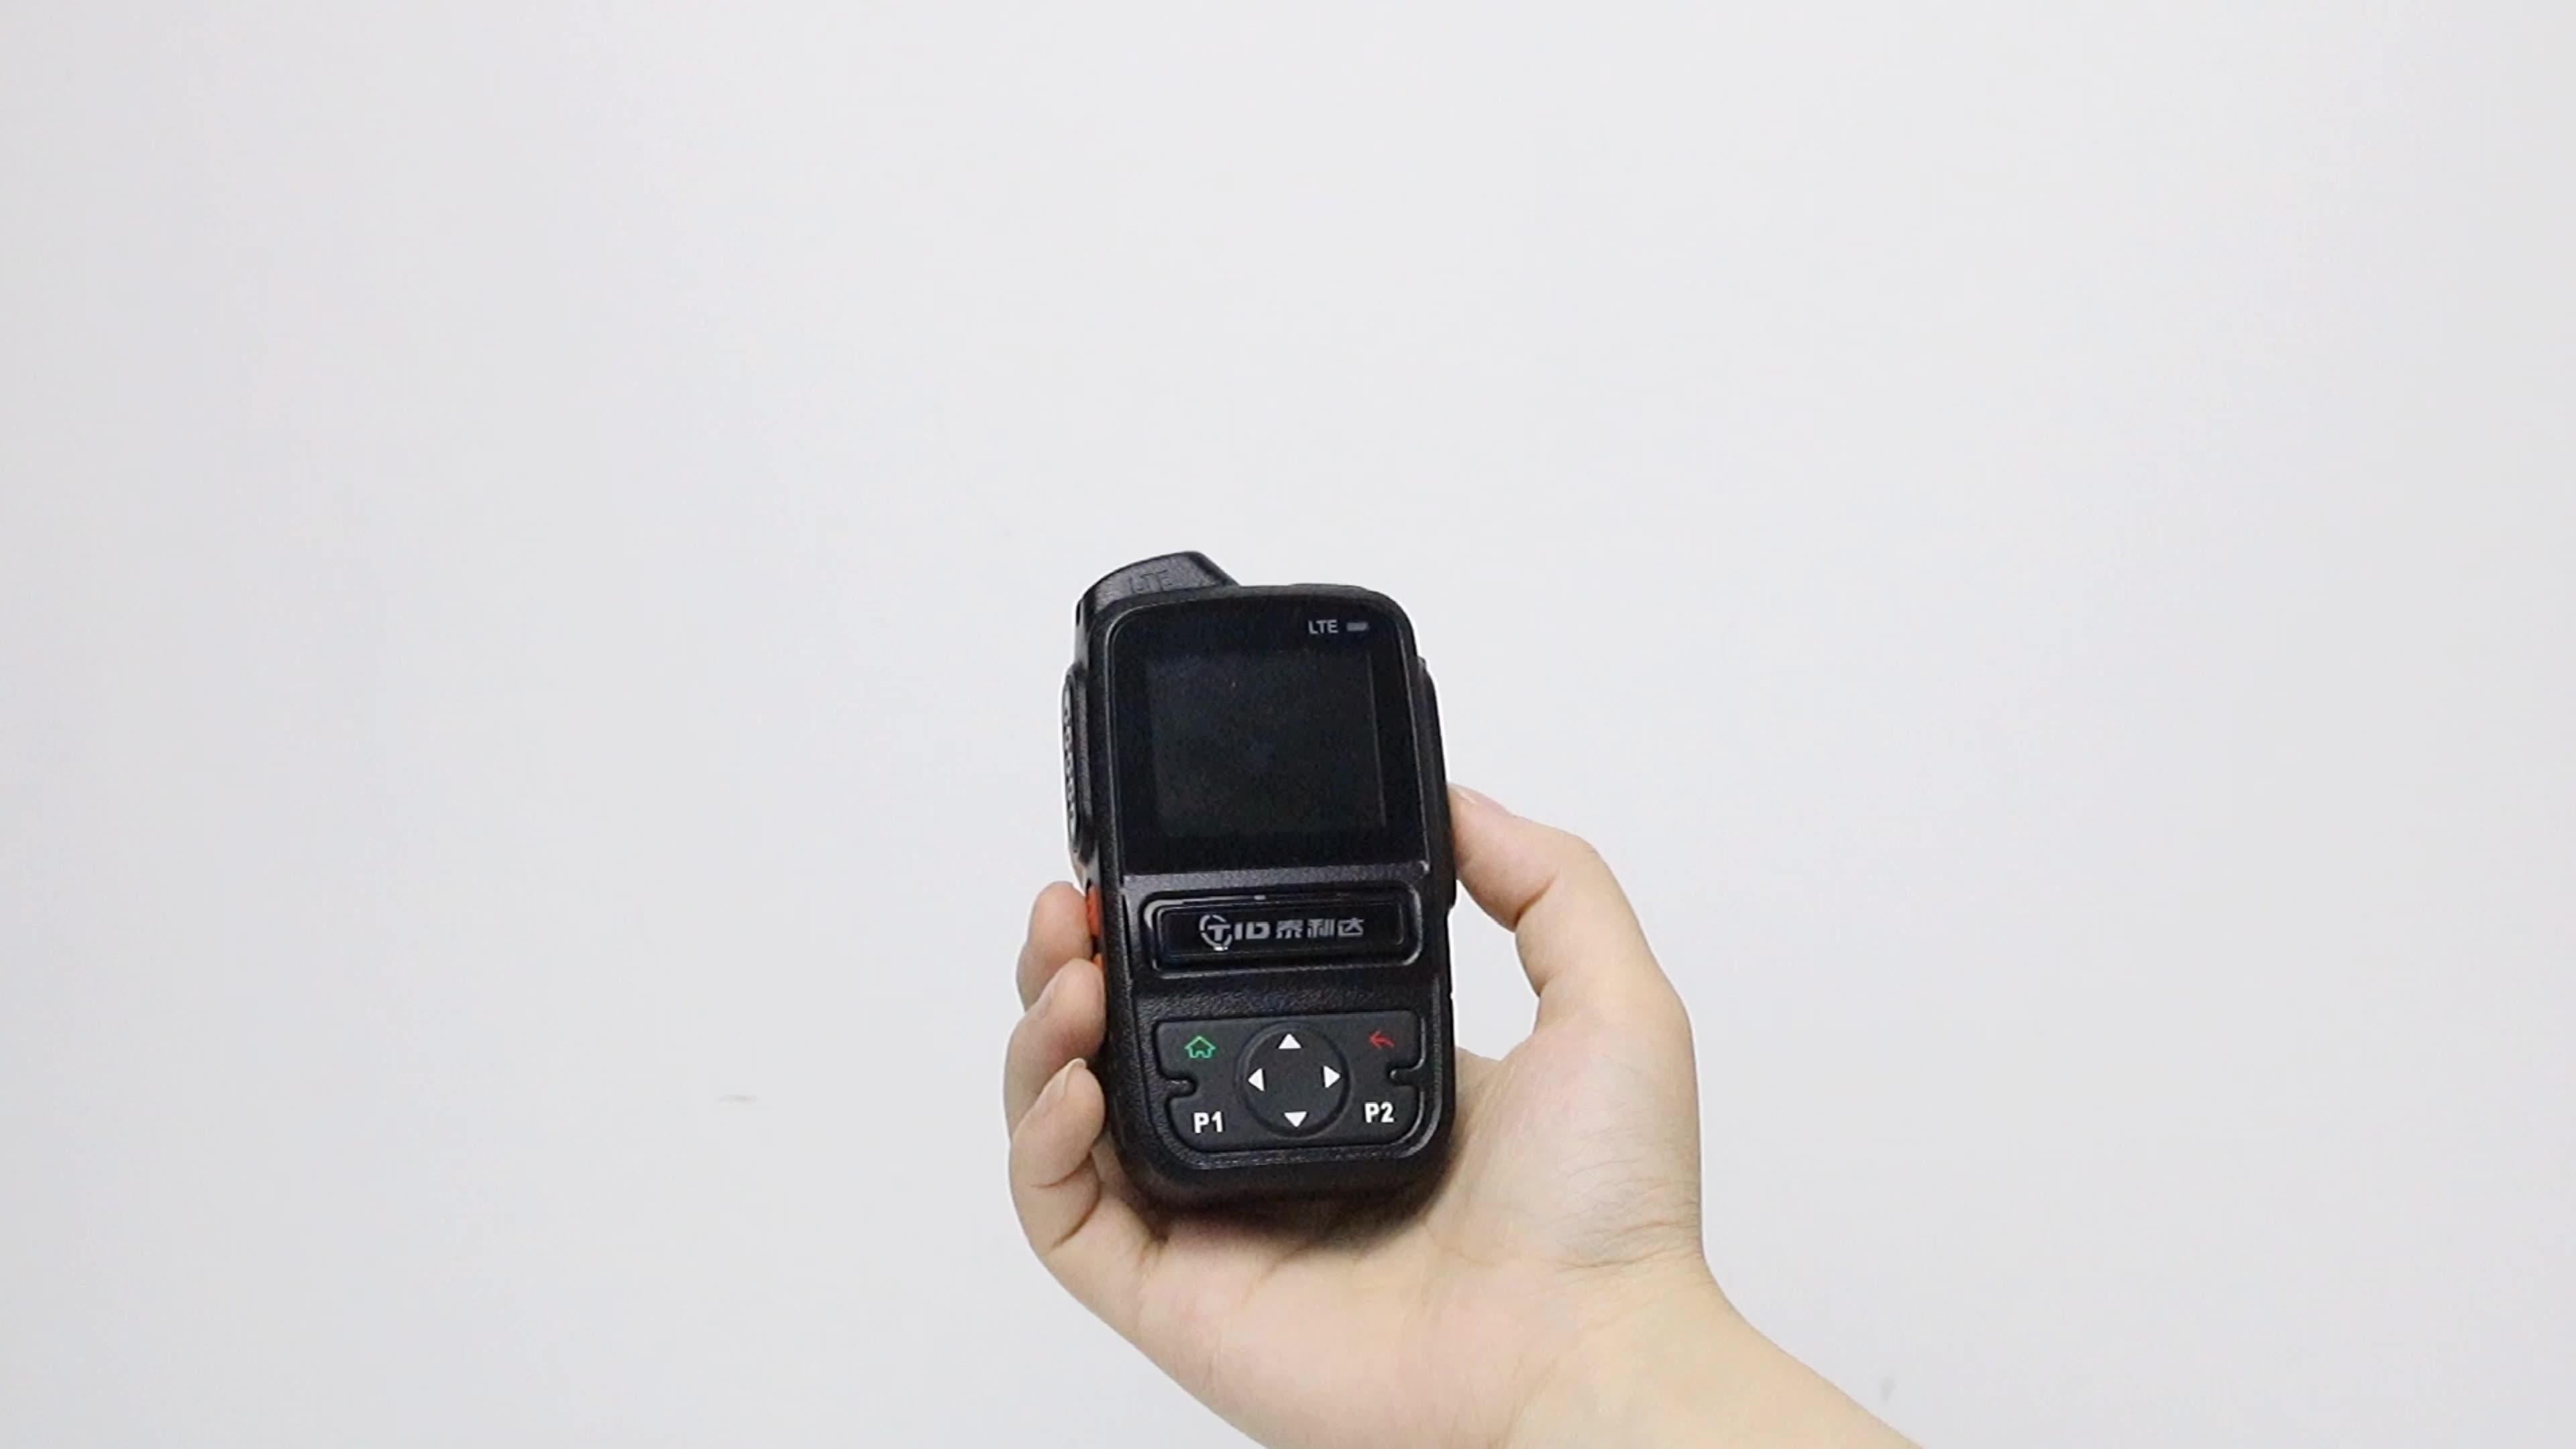 TID LTE WCDMA GSM שתי דרך רדיו dual SIM כרטיס IP ווקי טוקי 3G 4G PTT poc רדיו תקשורת